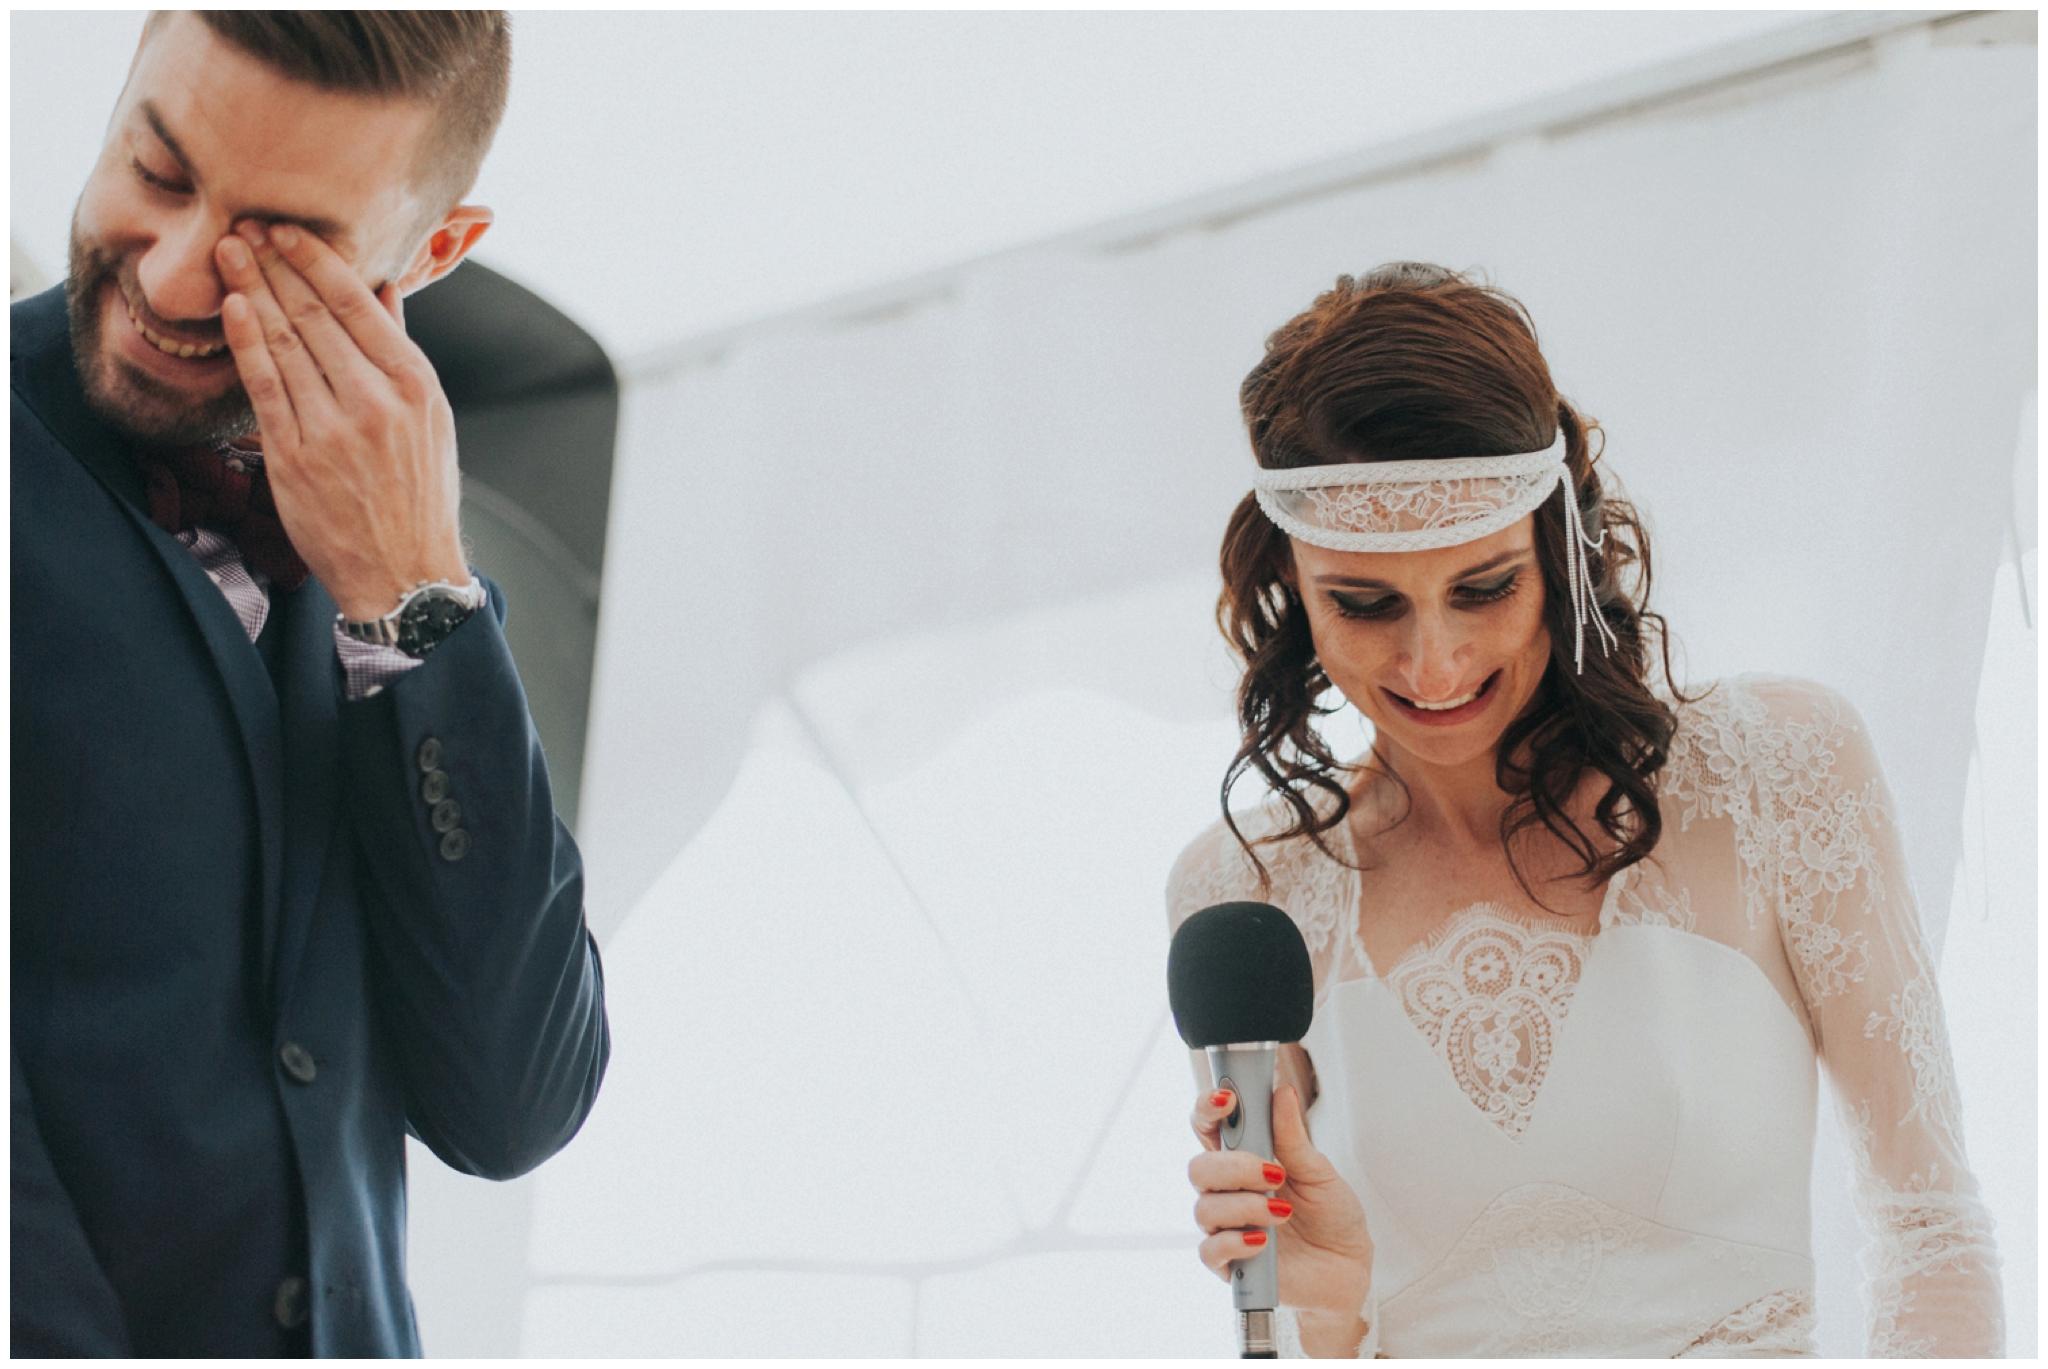 photographe-mariage-montagne-vercors-boho-folk-grenoble-annecy-alpes_0050